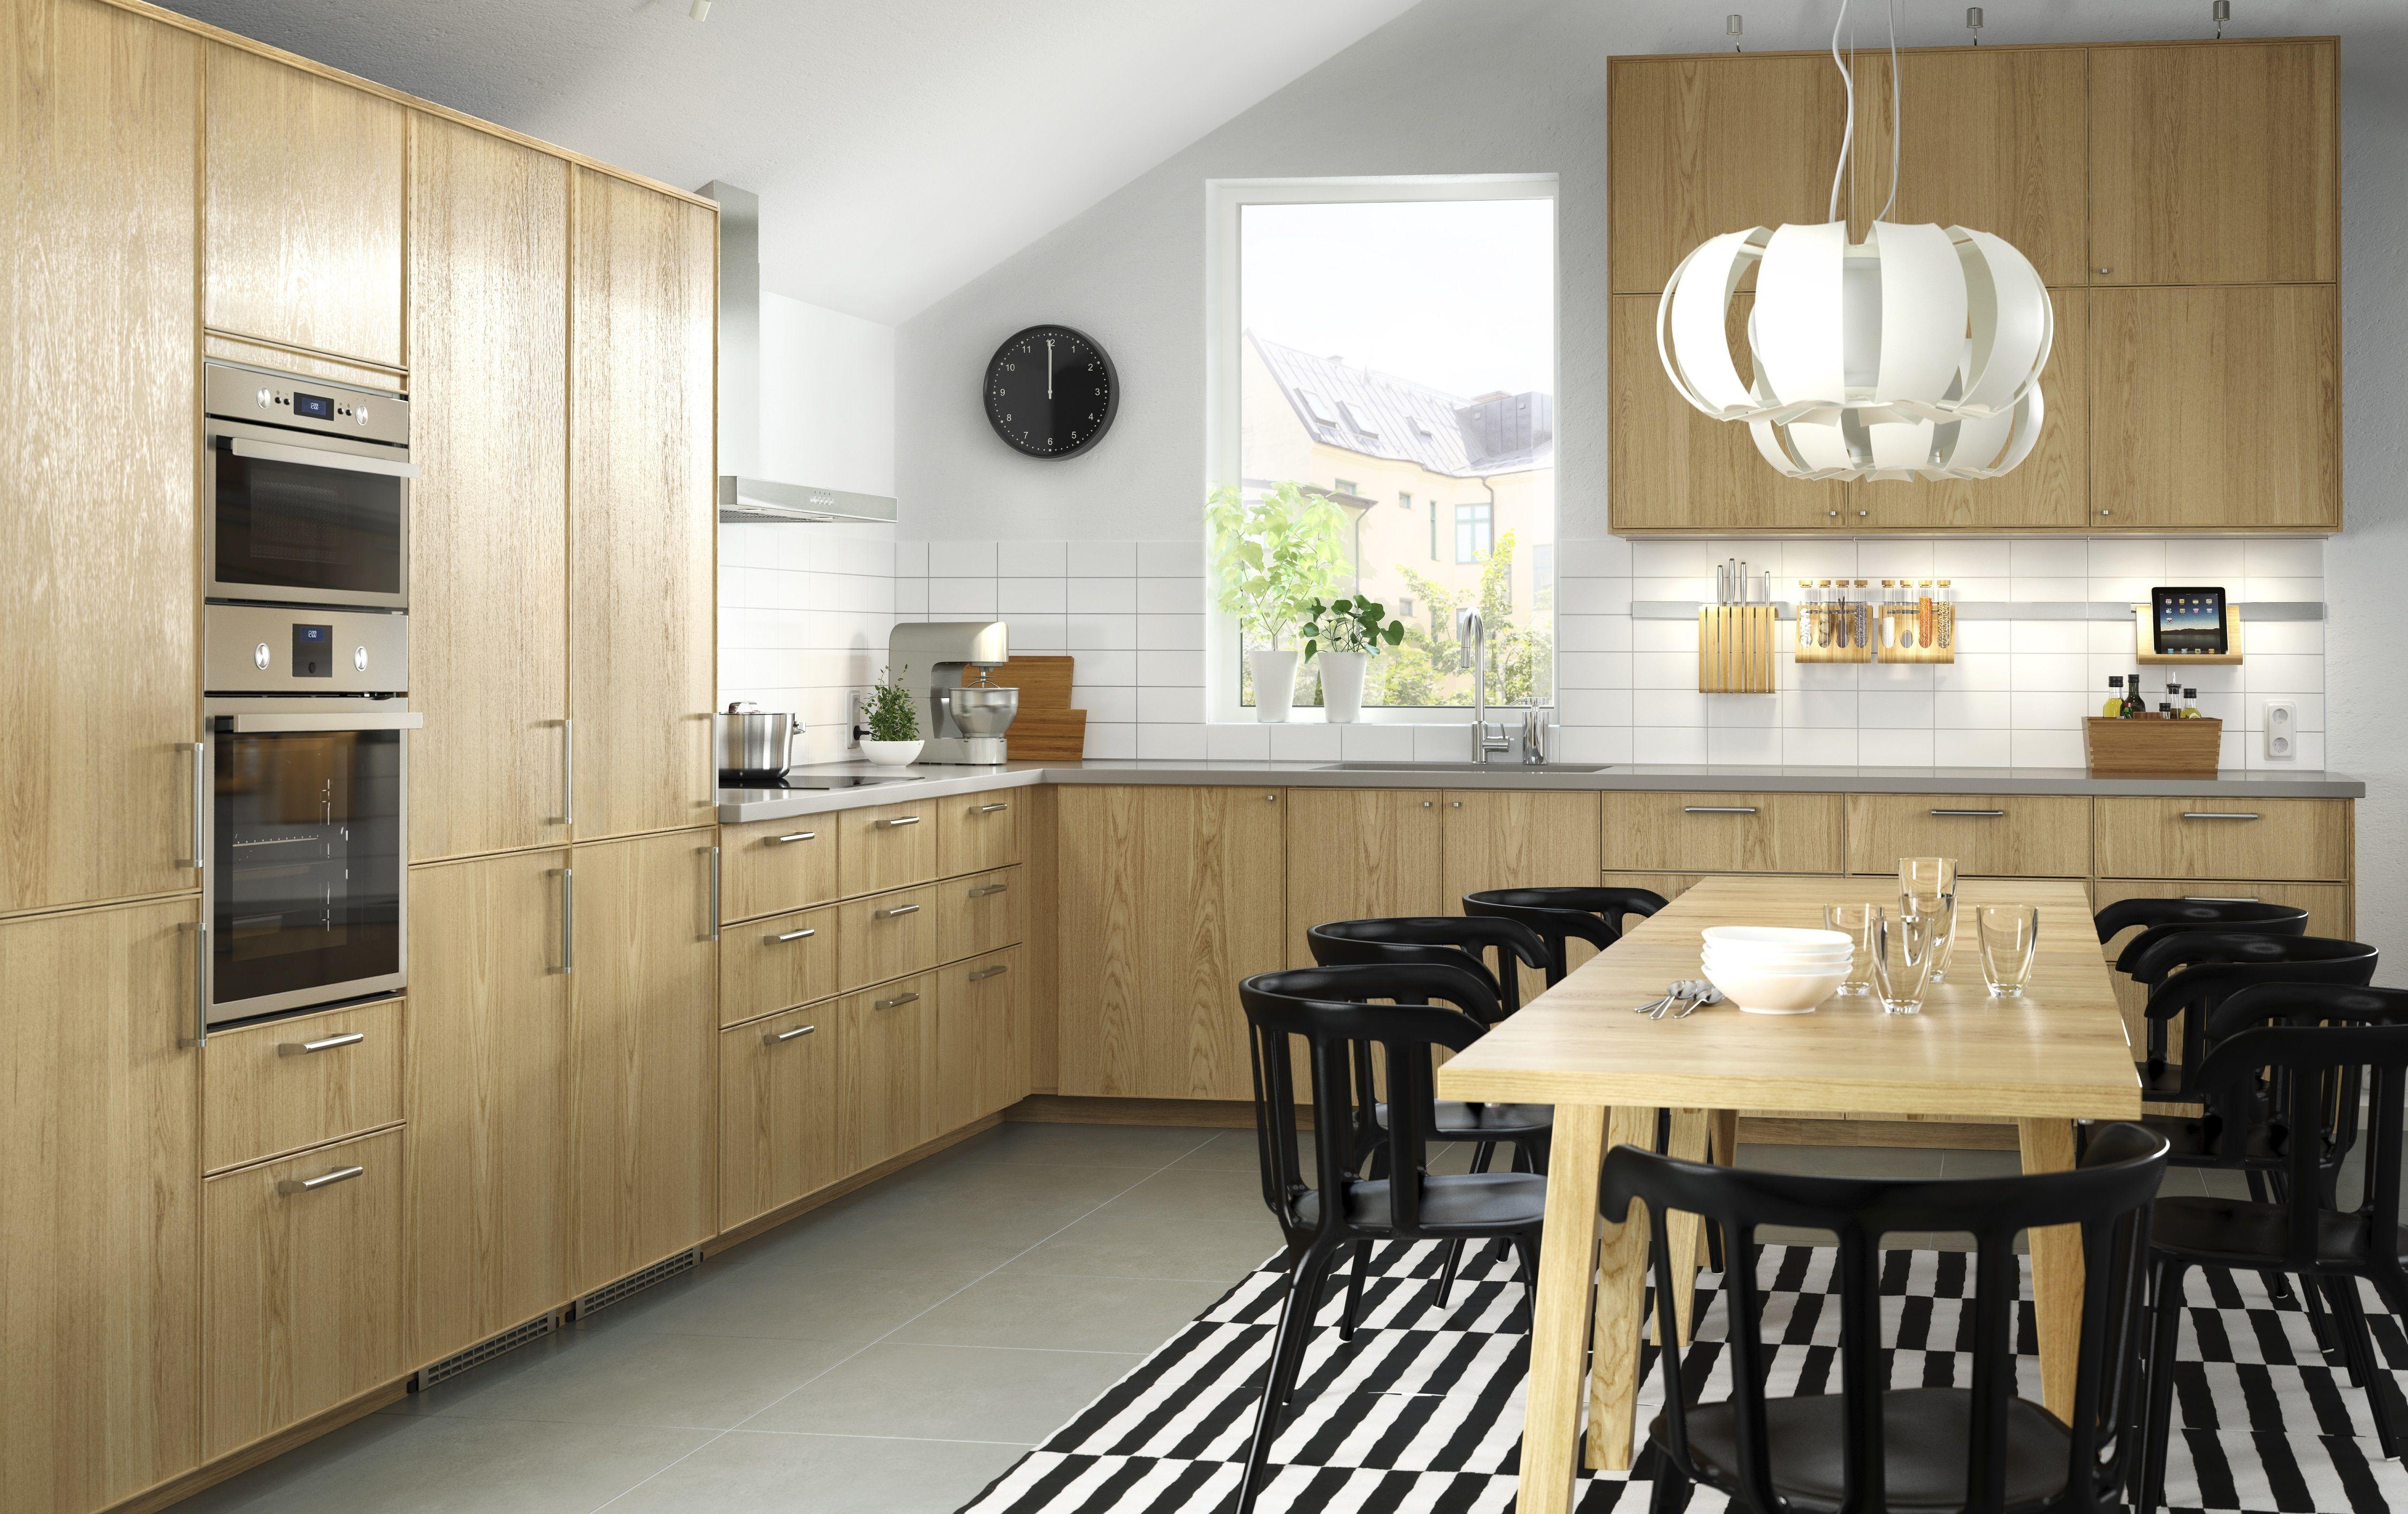 Ikea Ekestad Keuken : Metod keuken #ikea #ikeanl #hout #eetkeuken #keukensysteem